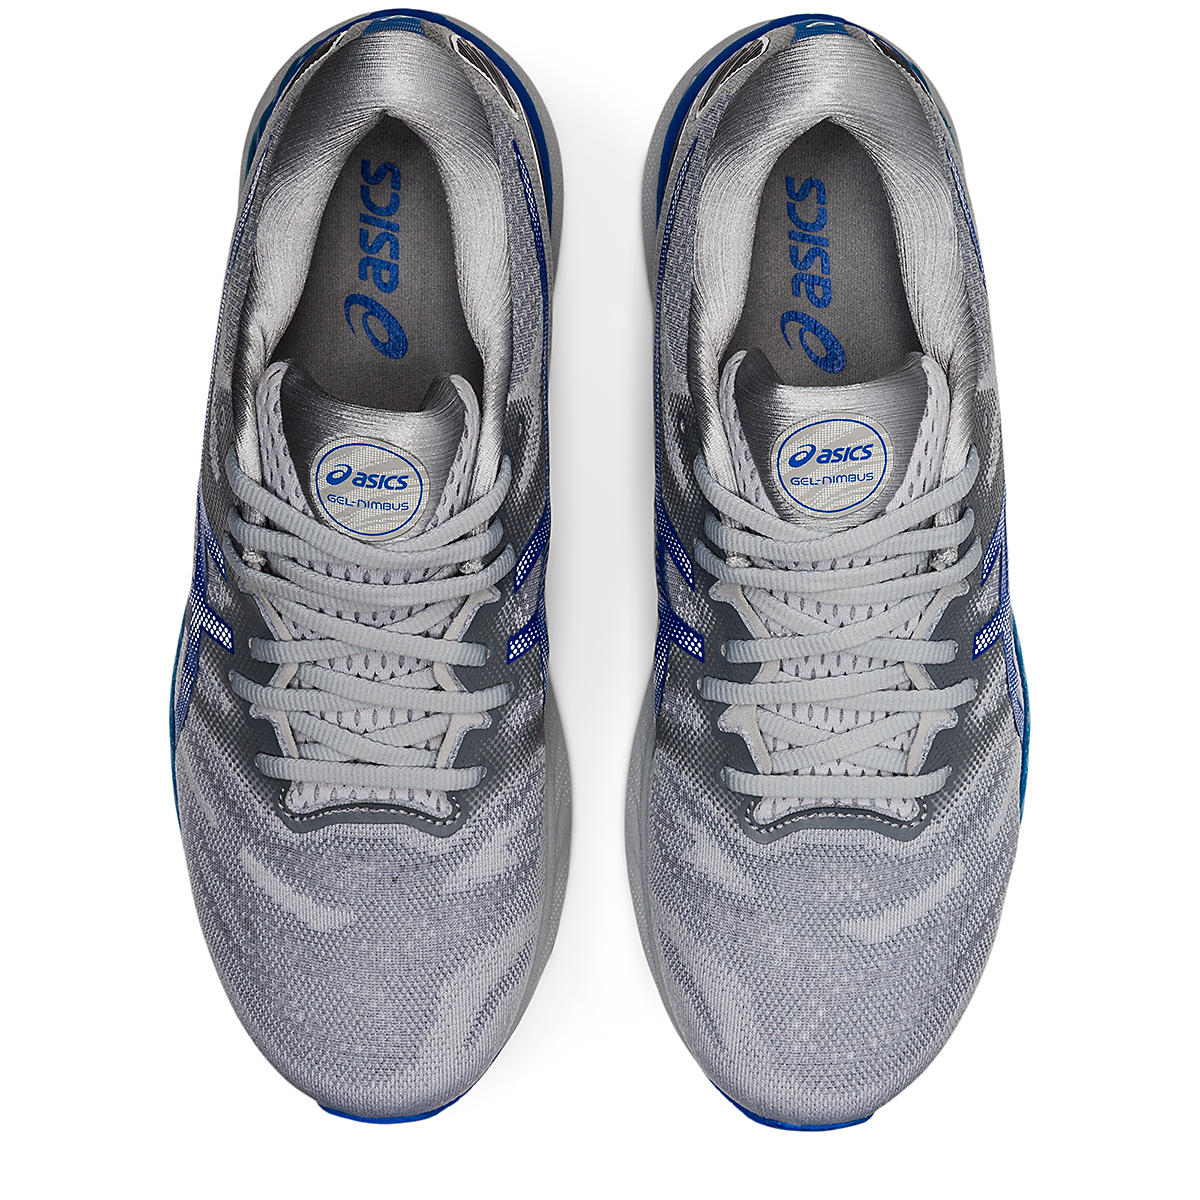 Men's Asics Gel-Nimbus 23 Running Shoe - Color: Piedmont Grey - Size: 6 - Width: Regular, Piedmont Grey, large, image 5